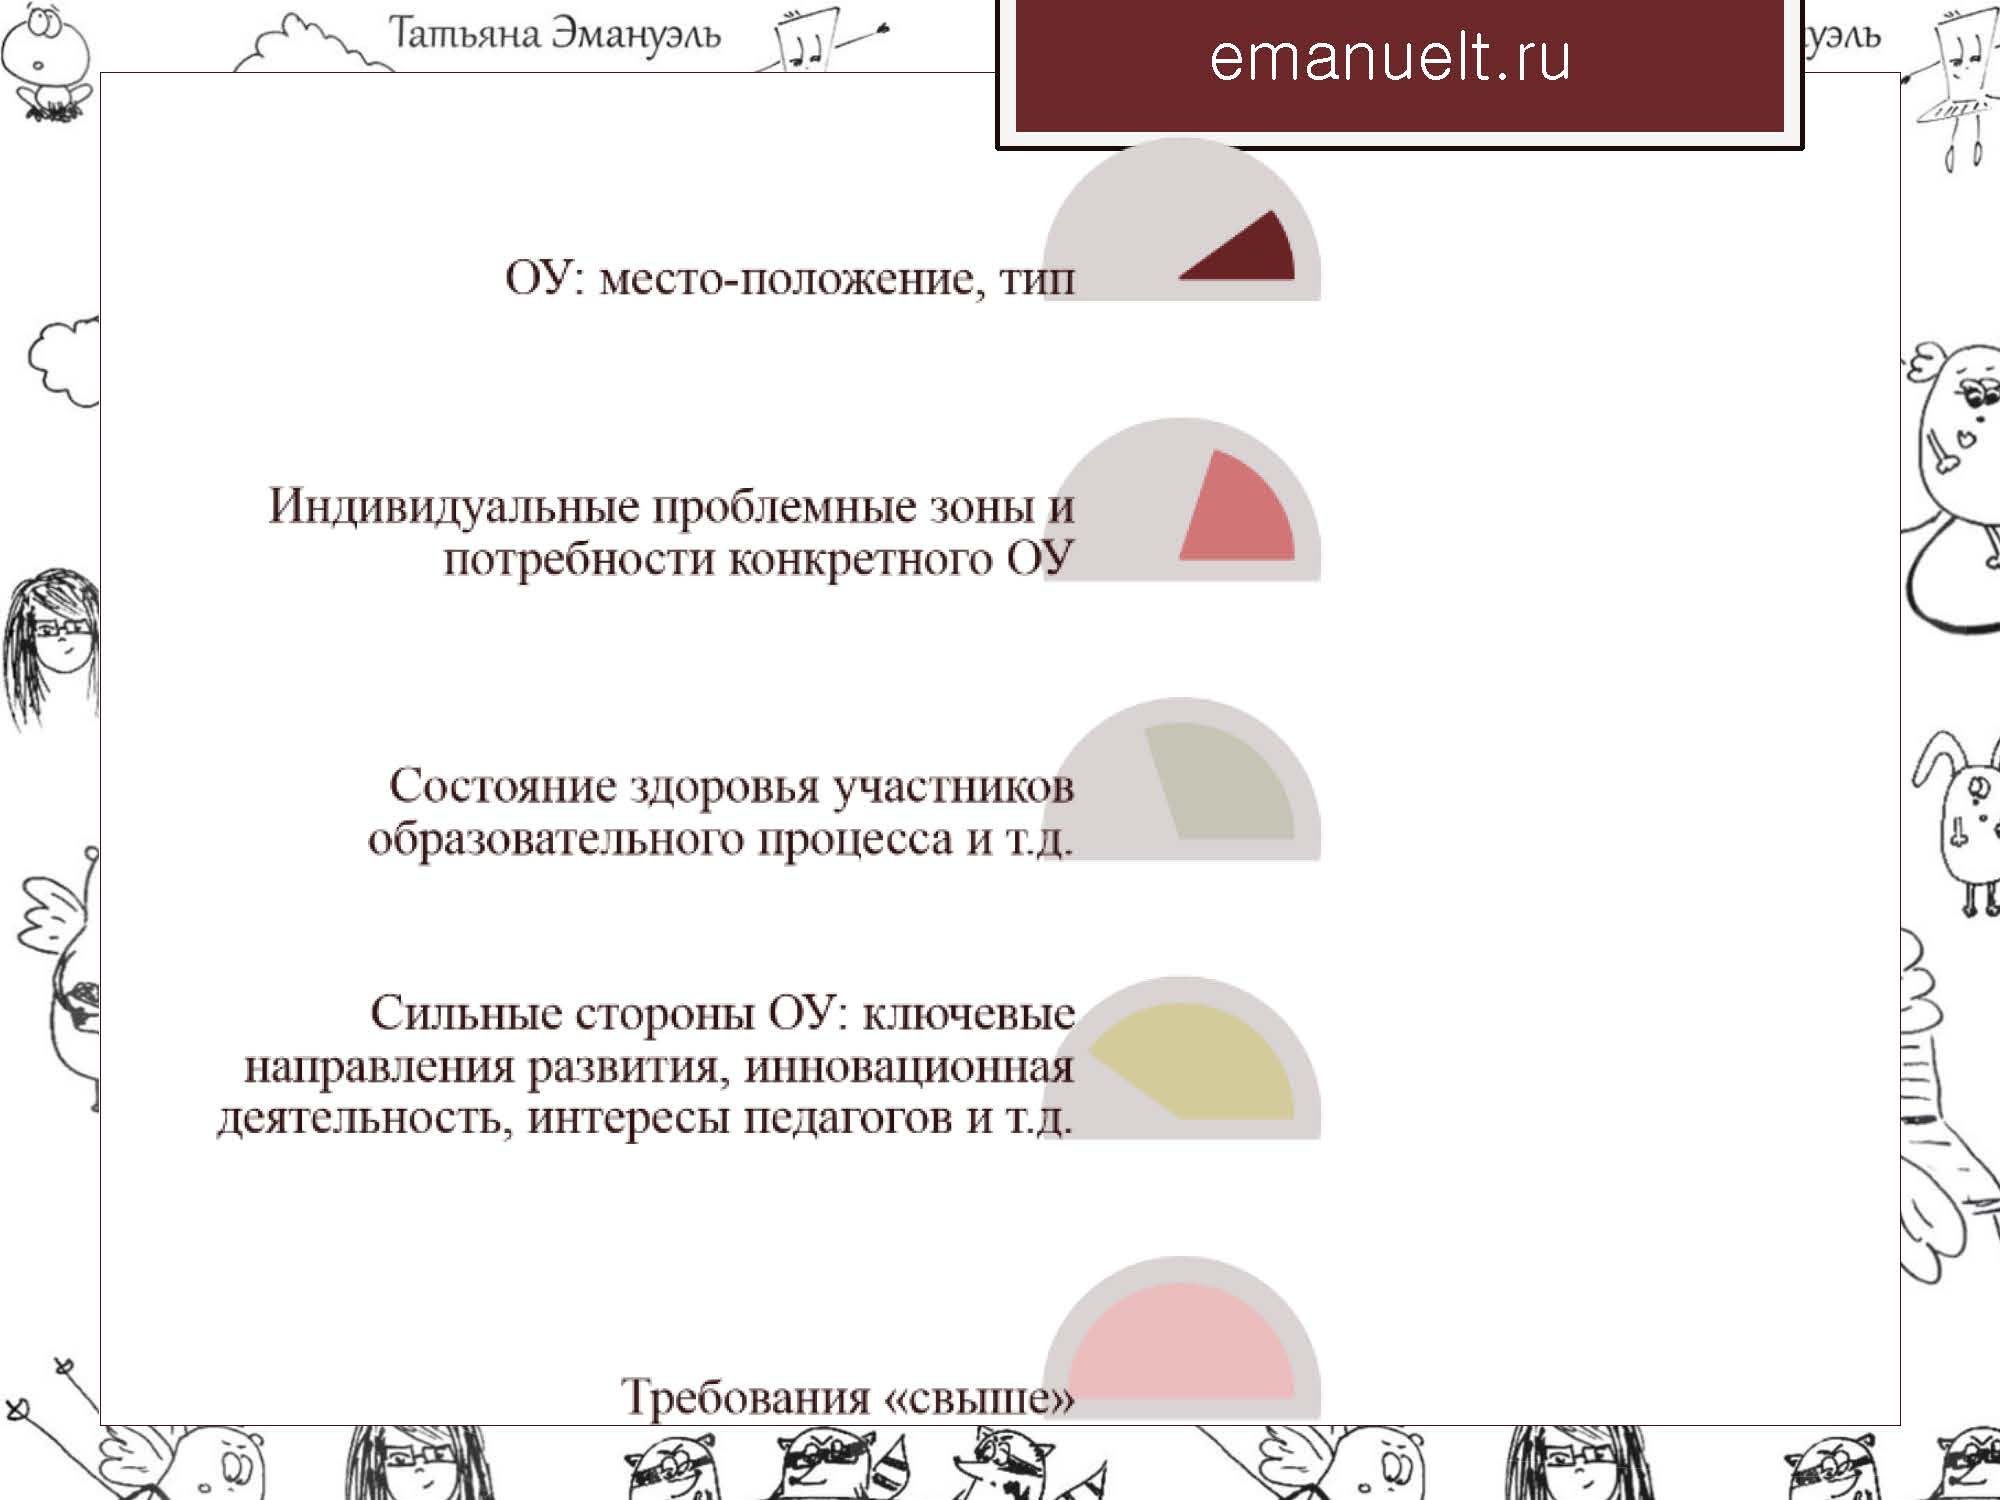 06 февраля эмануэль_Страница_025